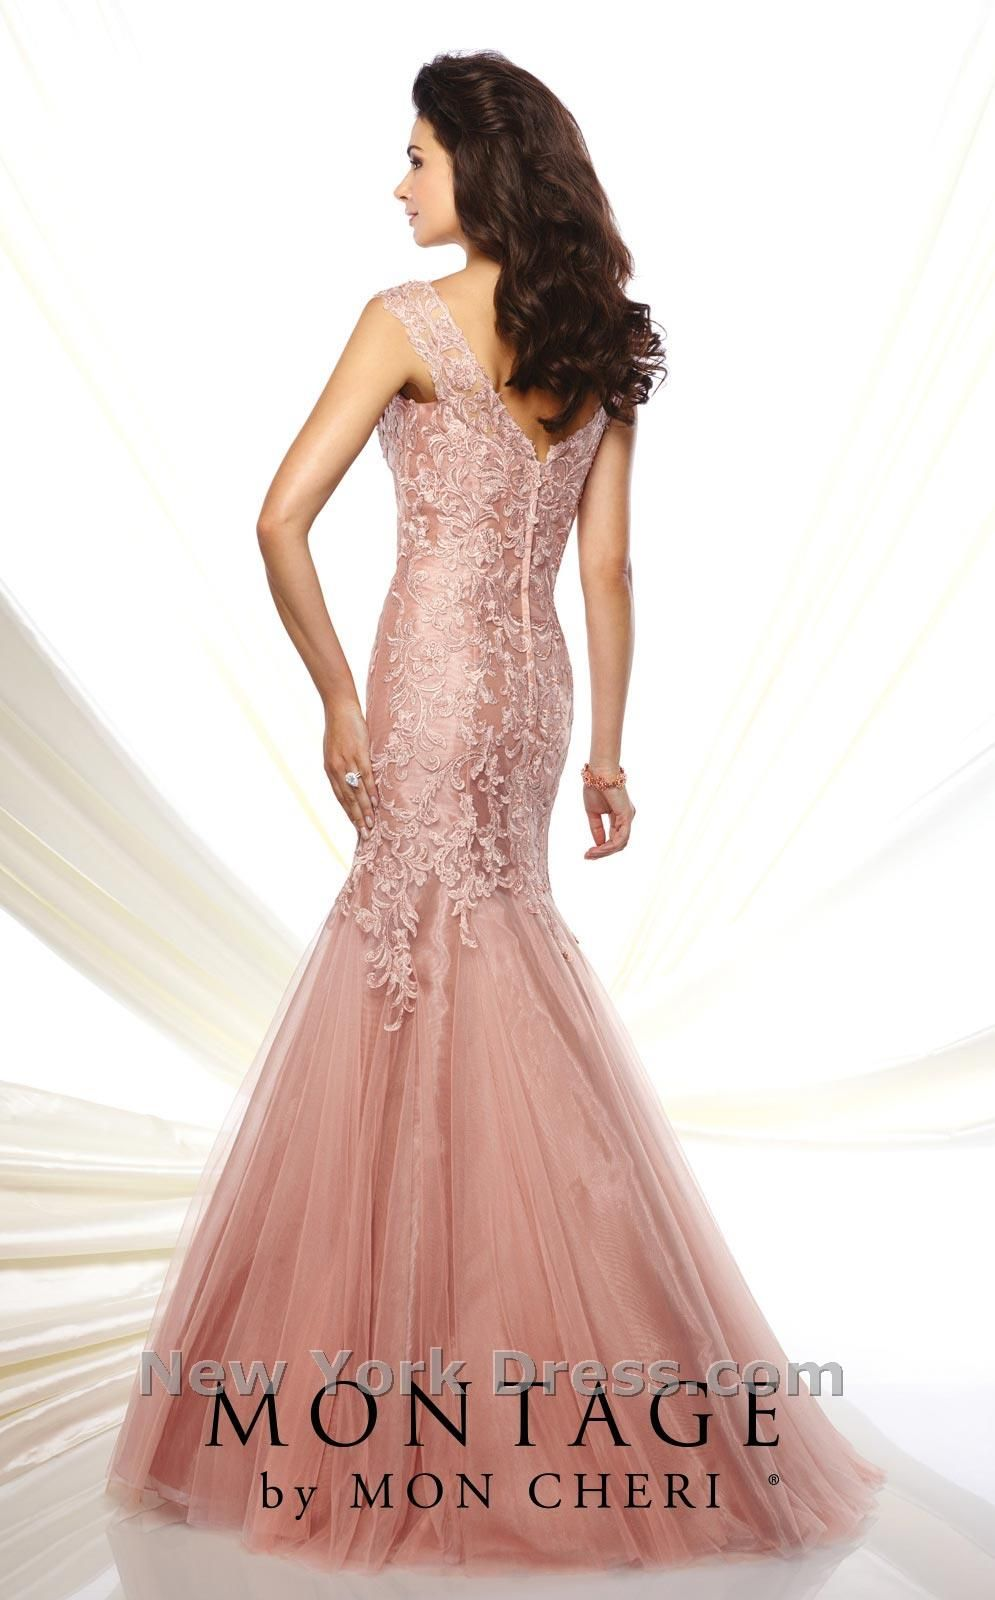 Pin de Cece El-Kishky en Evening dresses | Pinterest | Vestido ...